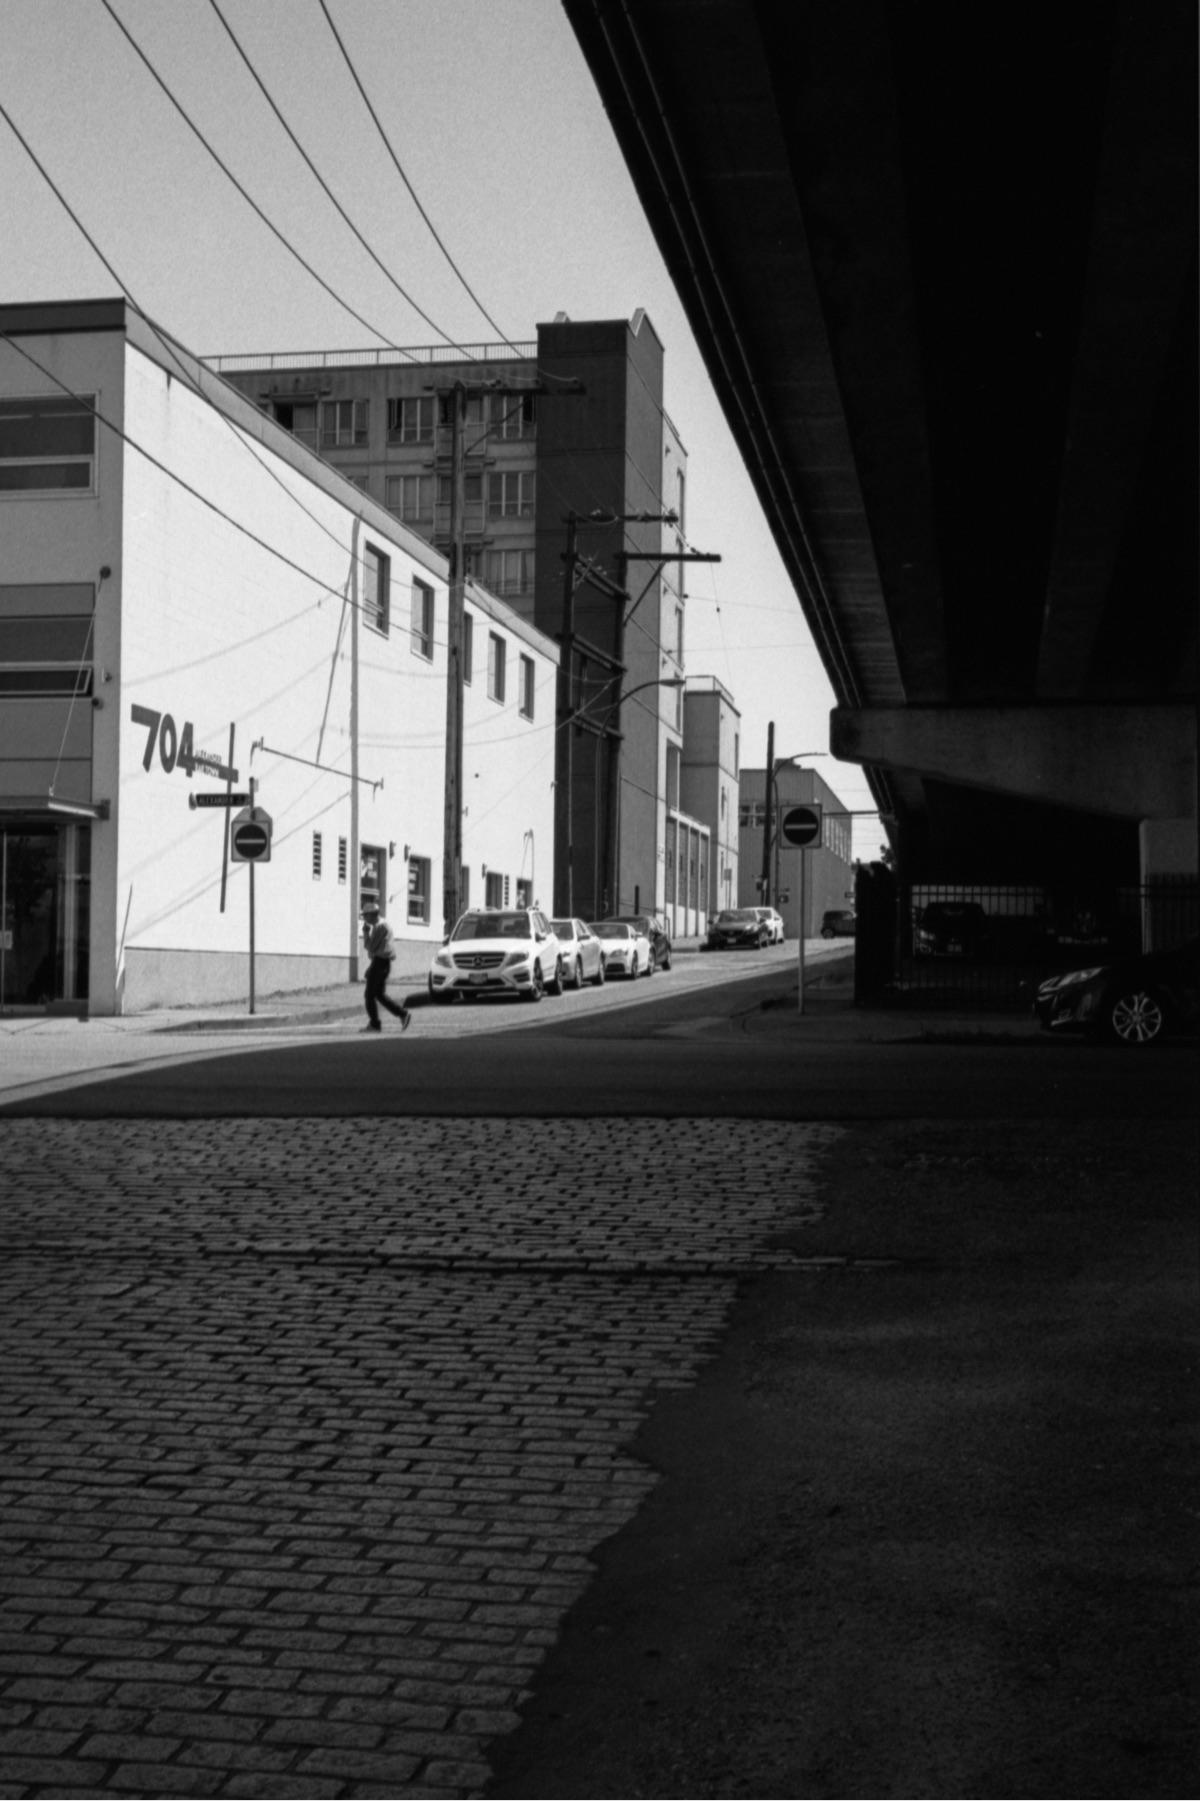 Earthbound Alexander Street - minoltacle - kch | ello